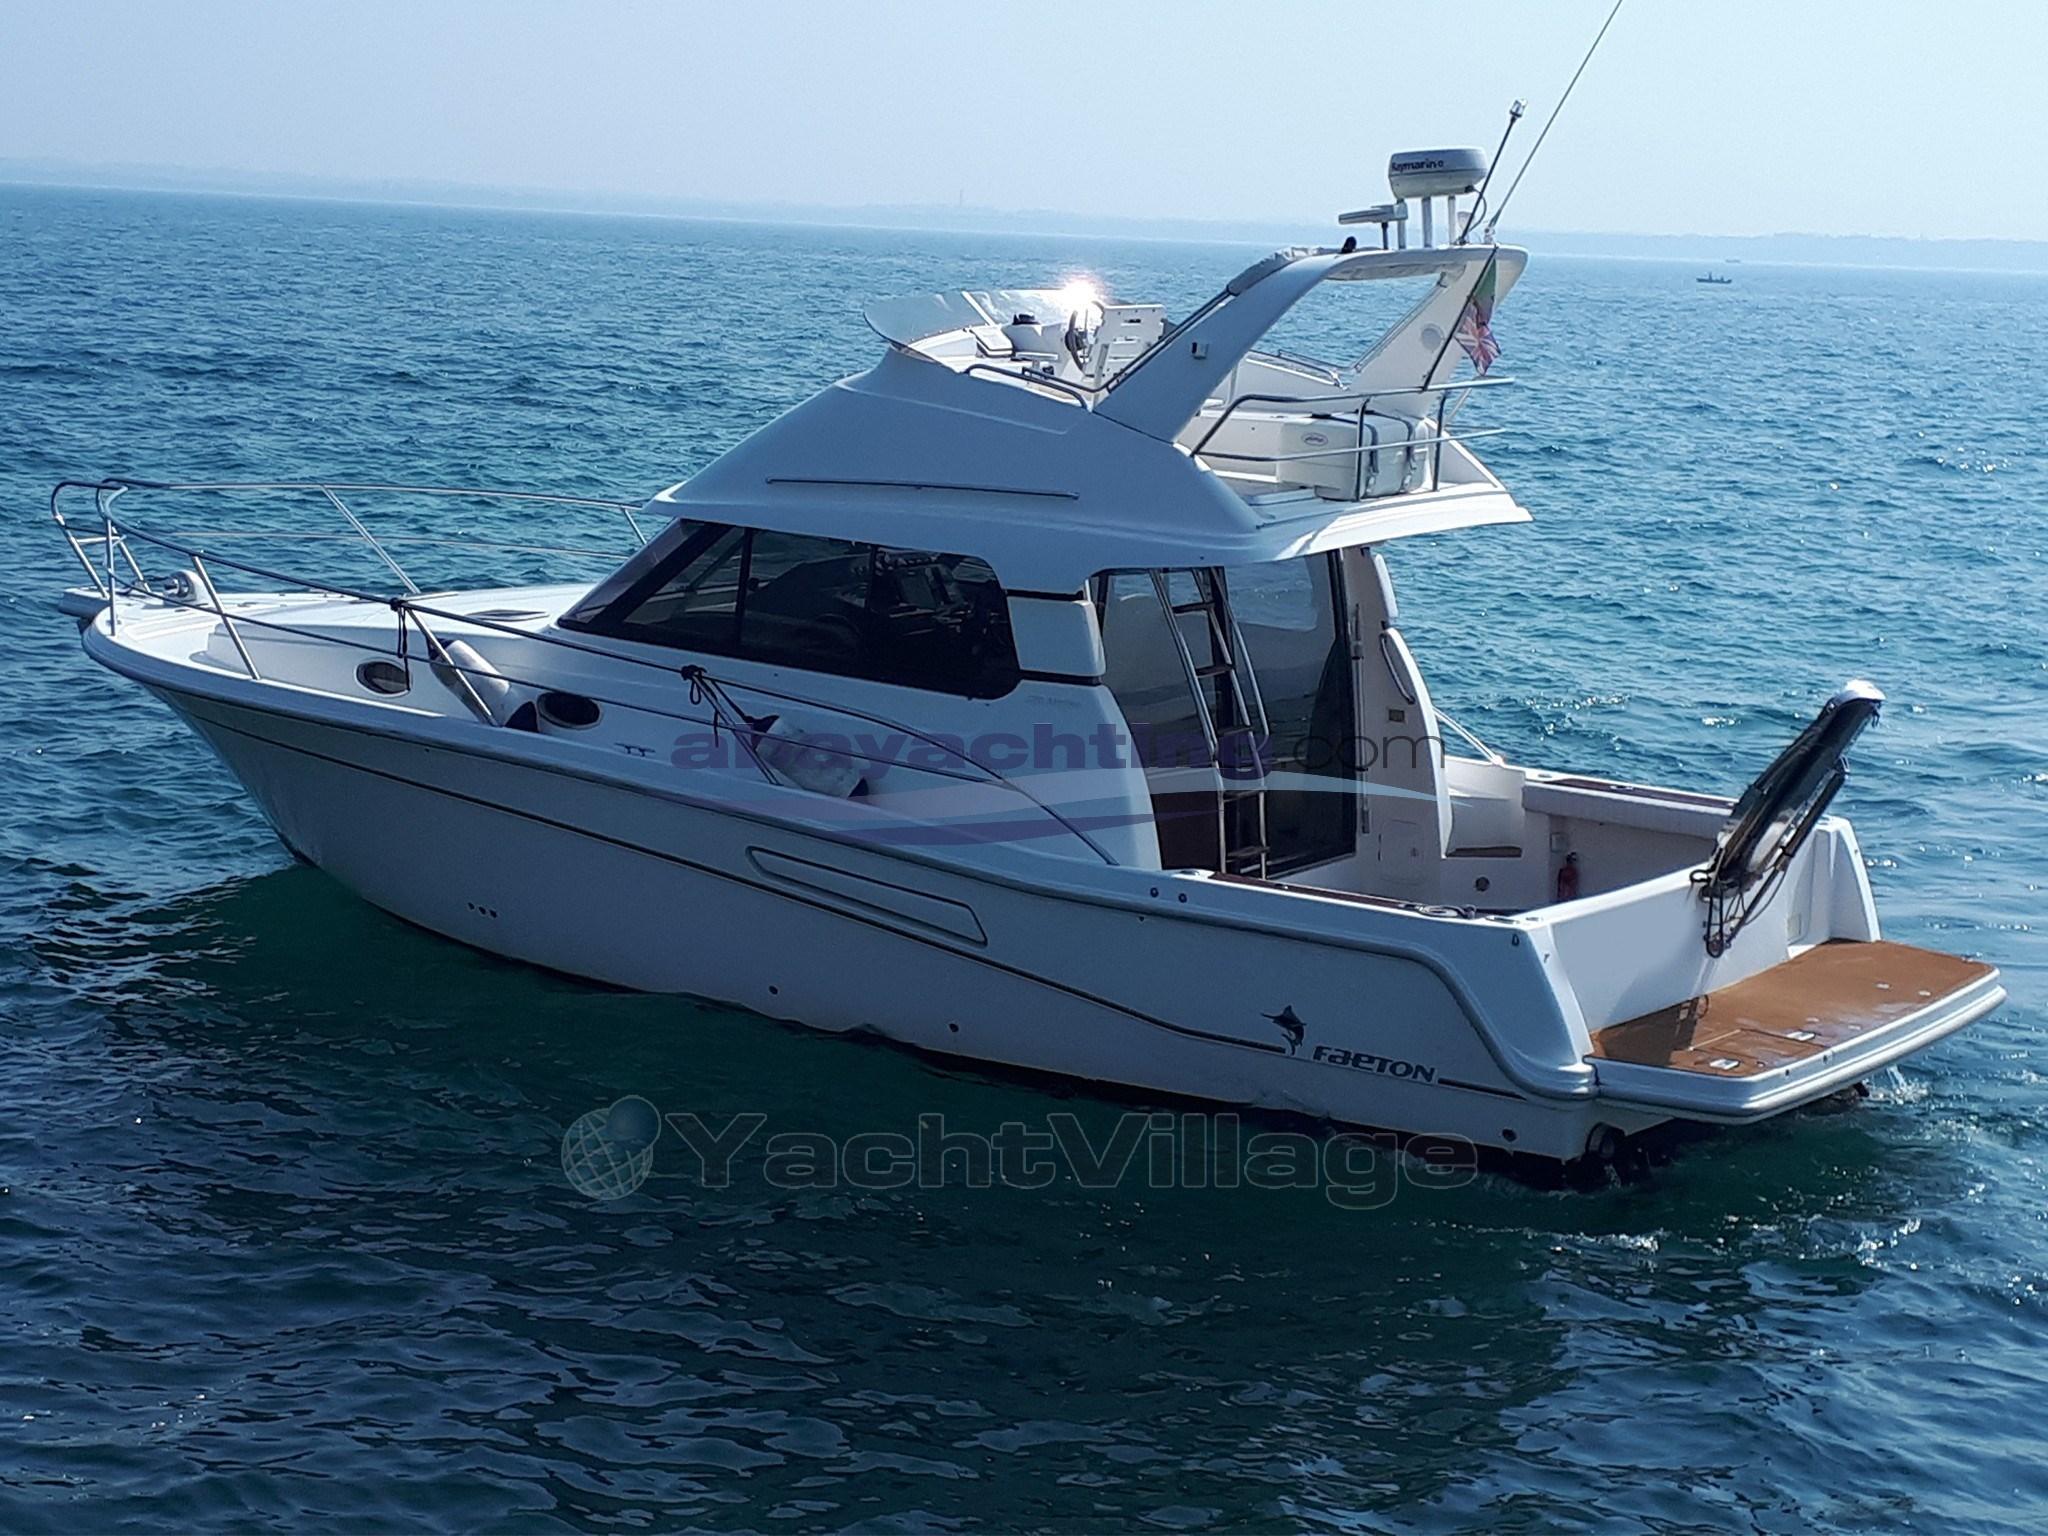 Abayachting Faeton Morgana 11,80 2